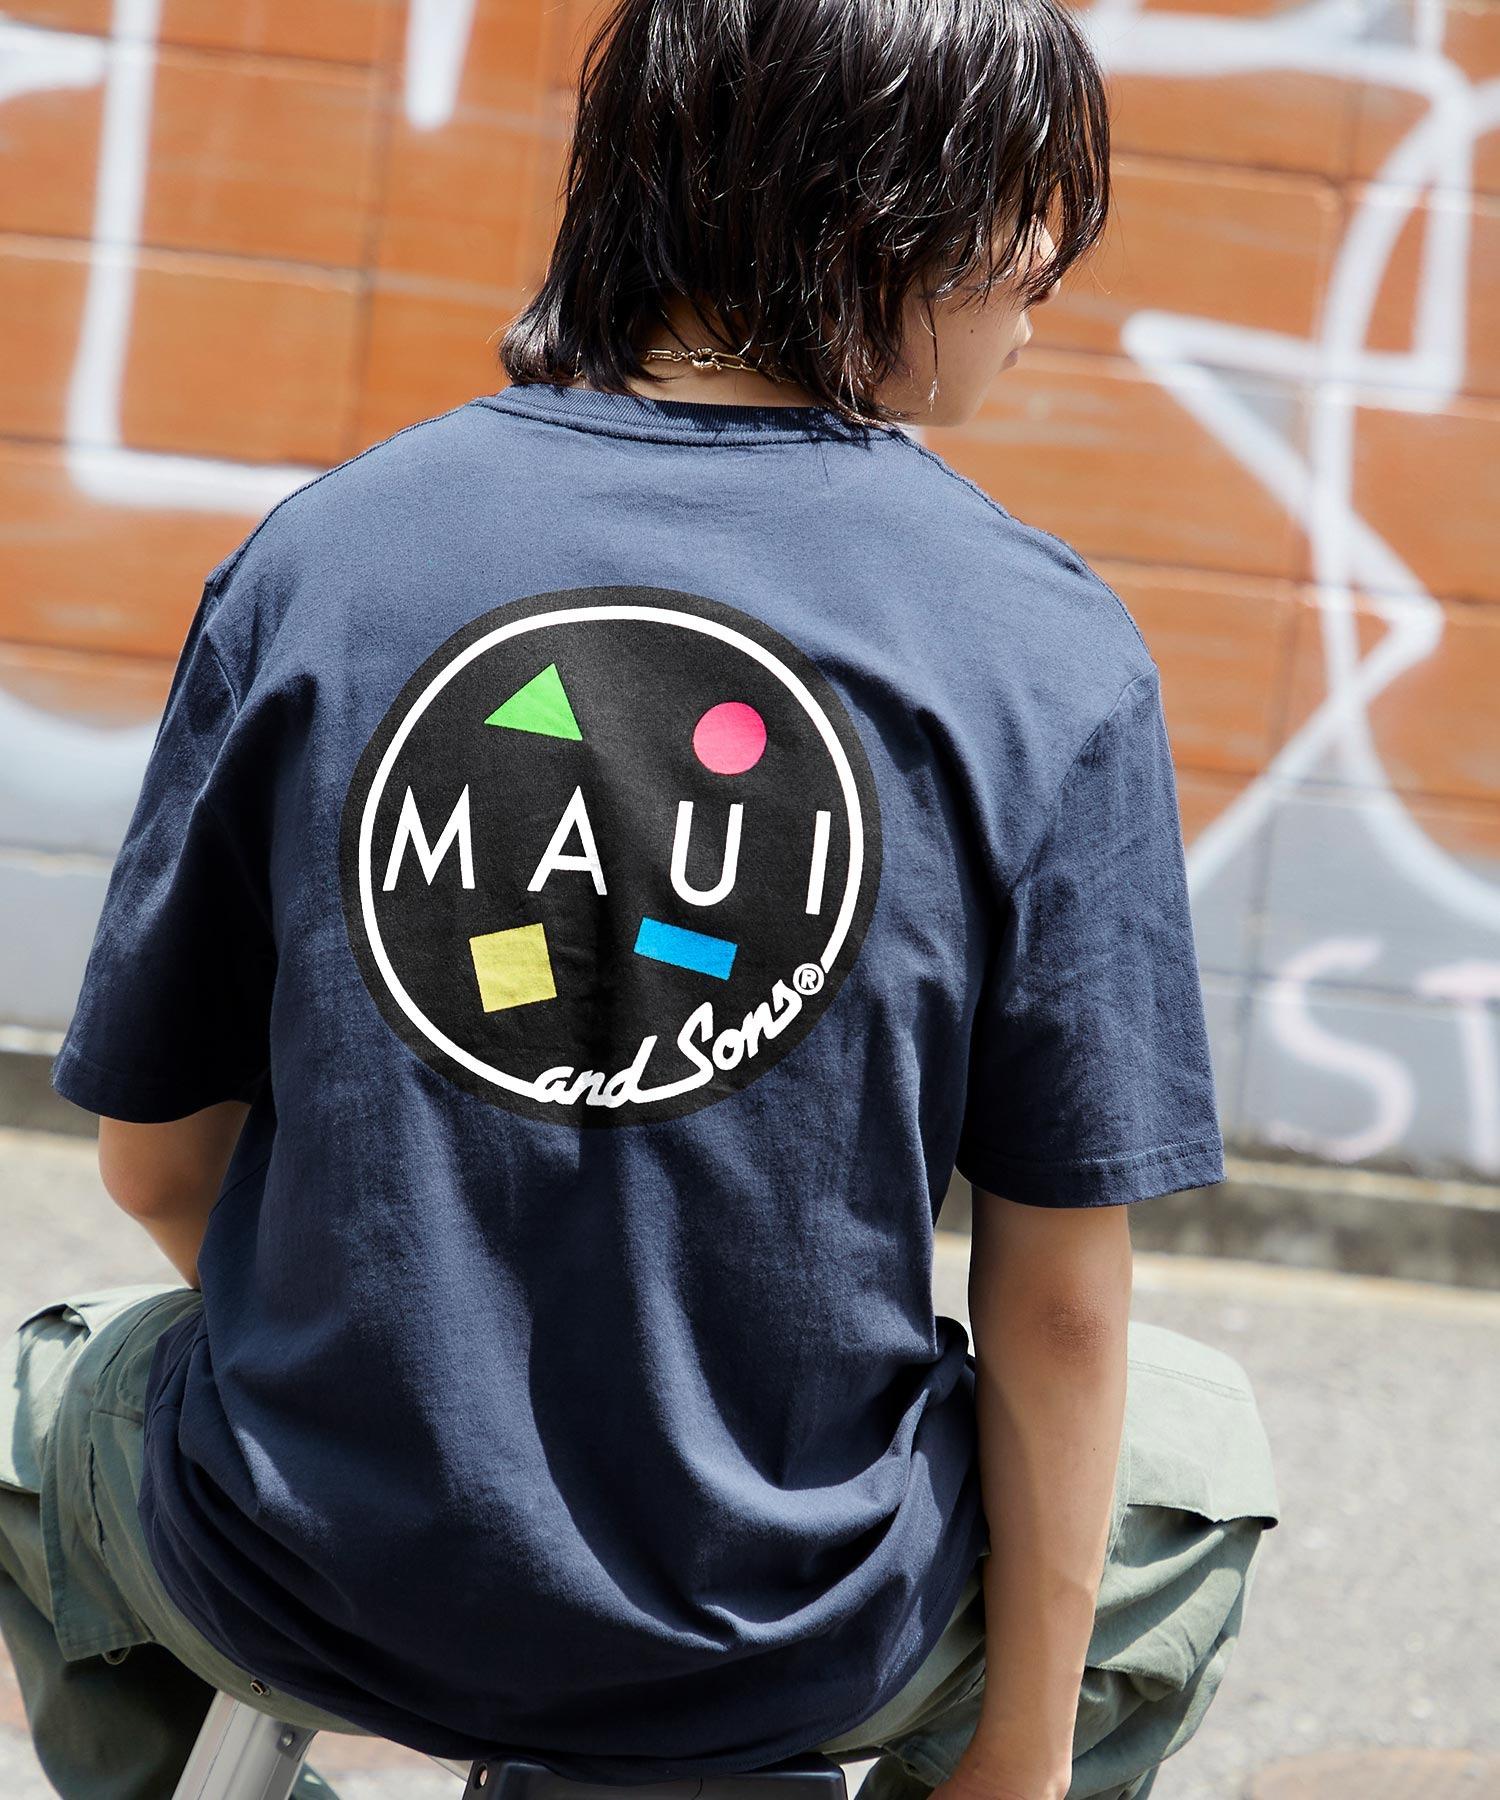 MAUI and Sons/マウイアンドサンズ S/S T-SHIRT COOKEI LOGO PRINT バッククッキーロゴプリント半袖Tシャツ